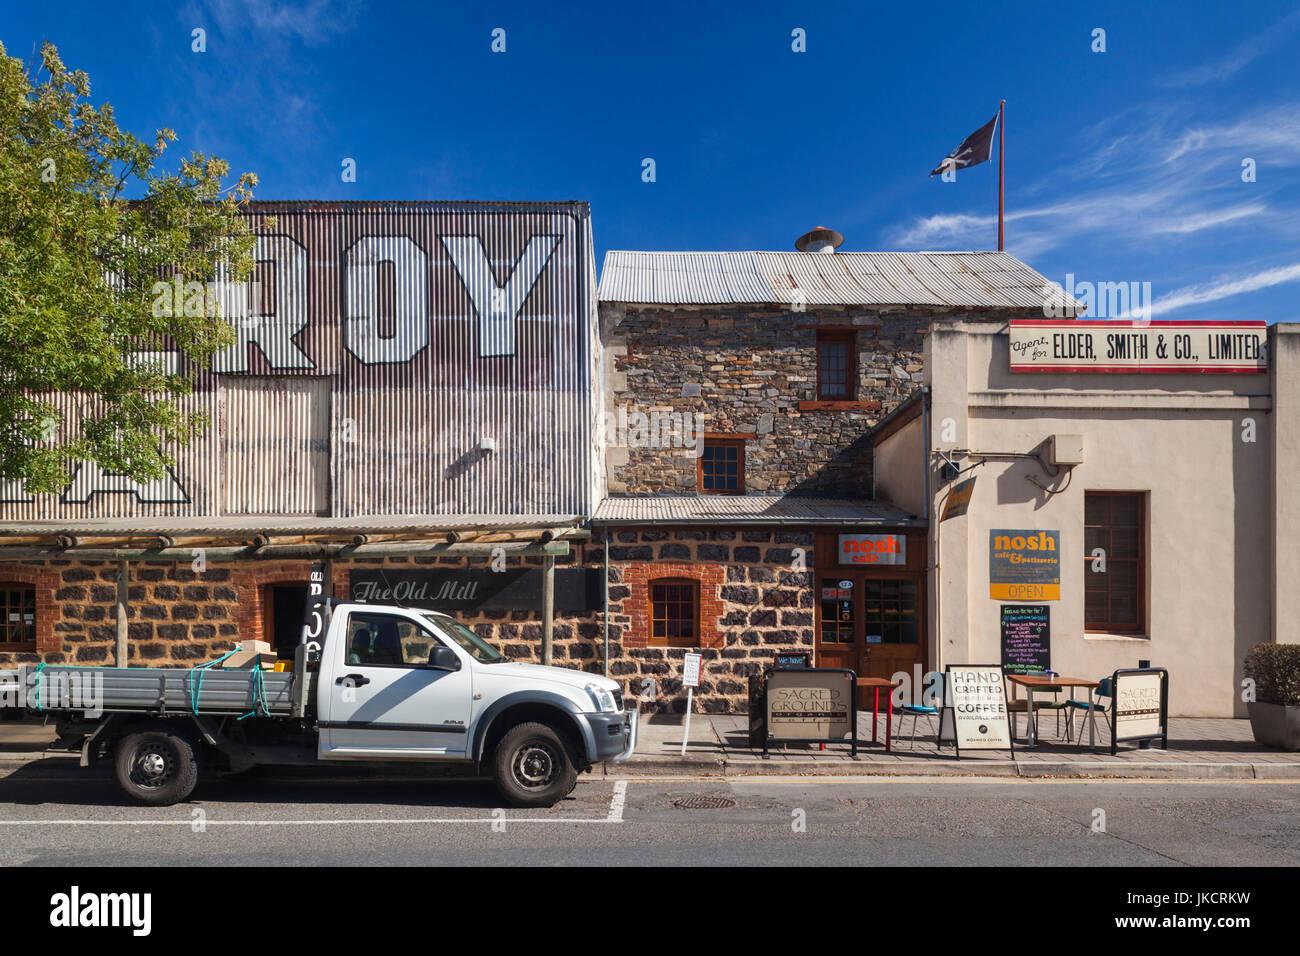 Australia, South Australia, Barossa Valley, Tanunda, Nosh Cafe, exterior - Stock Image